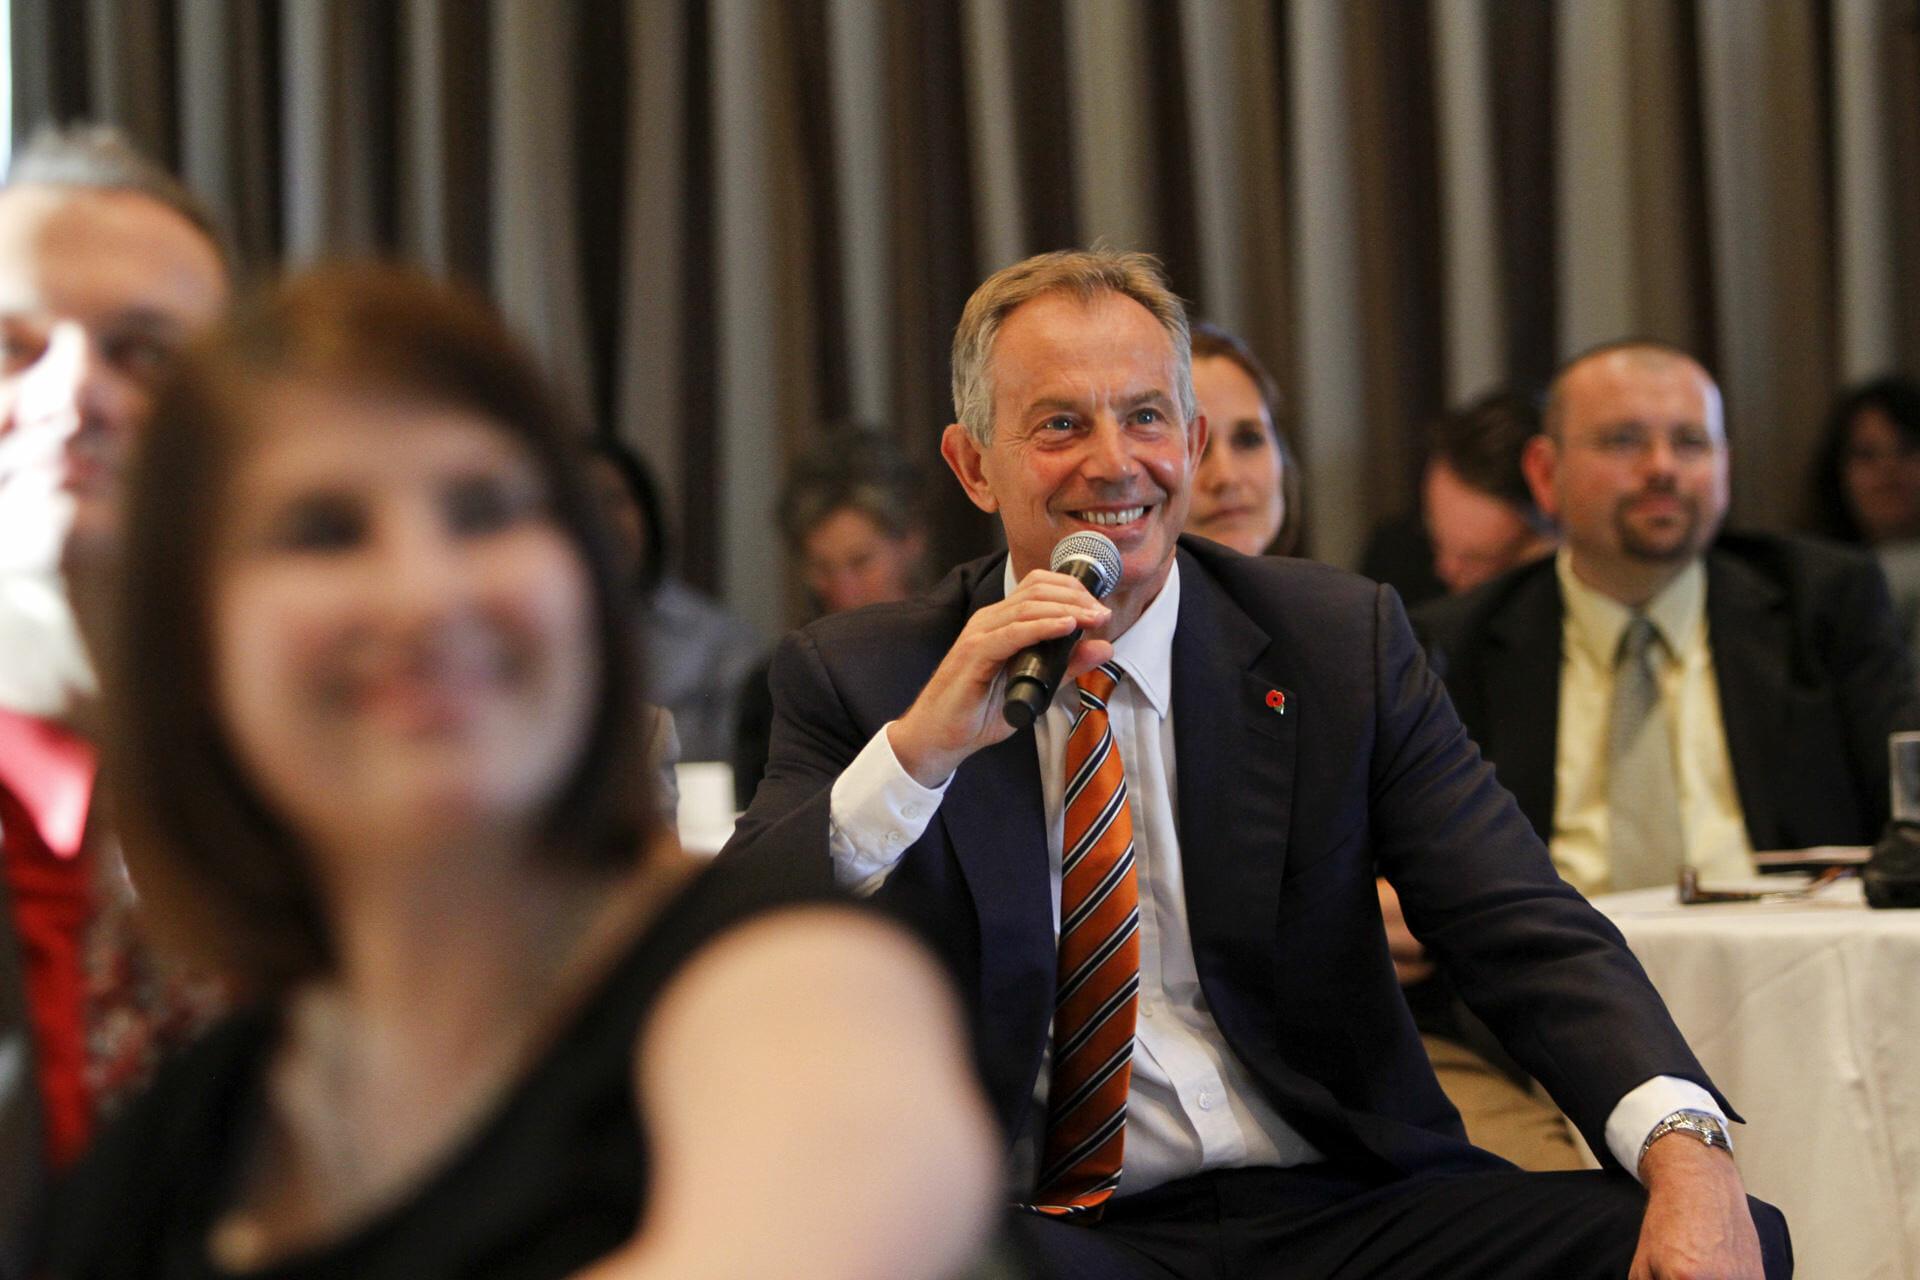 An Evening with Tony Blair